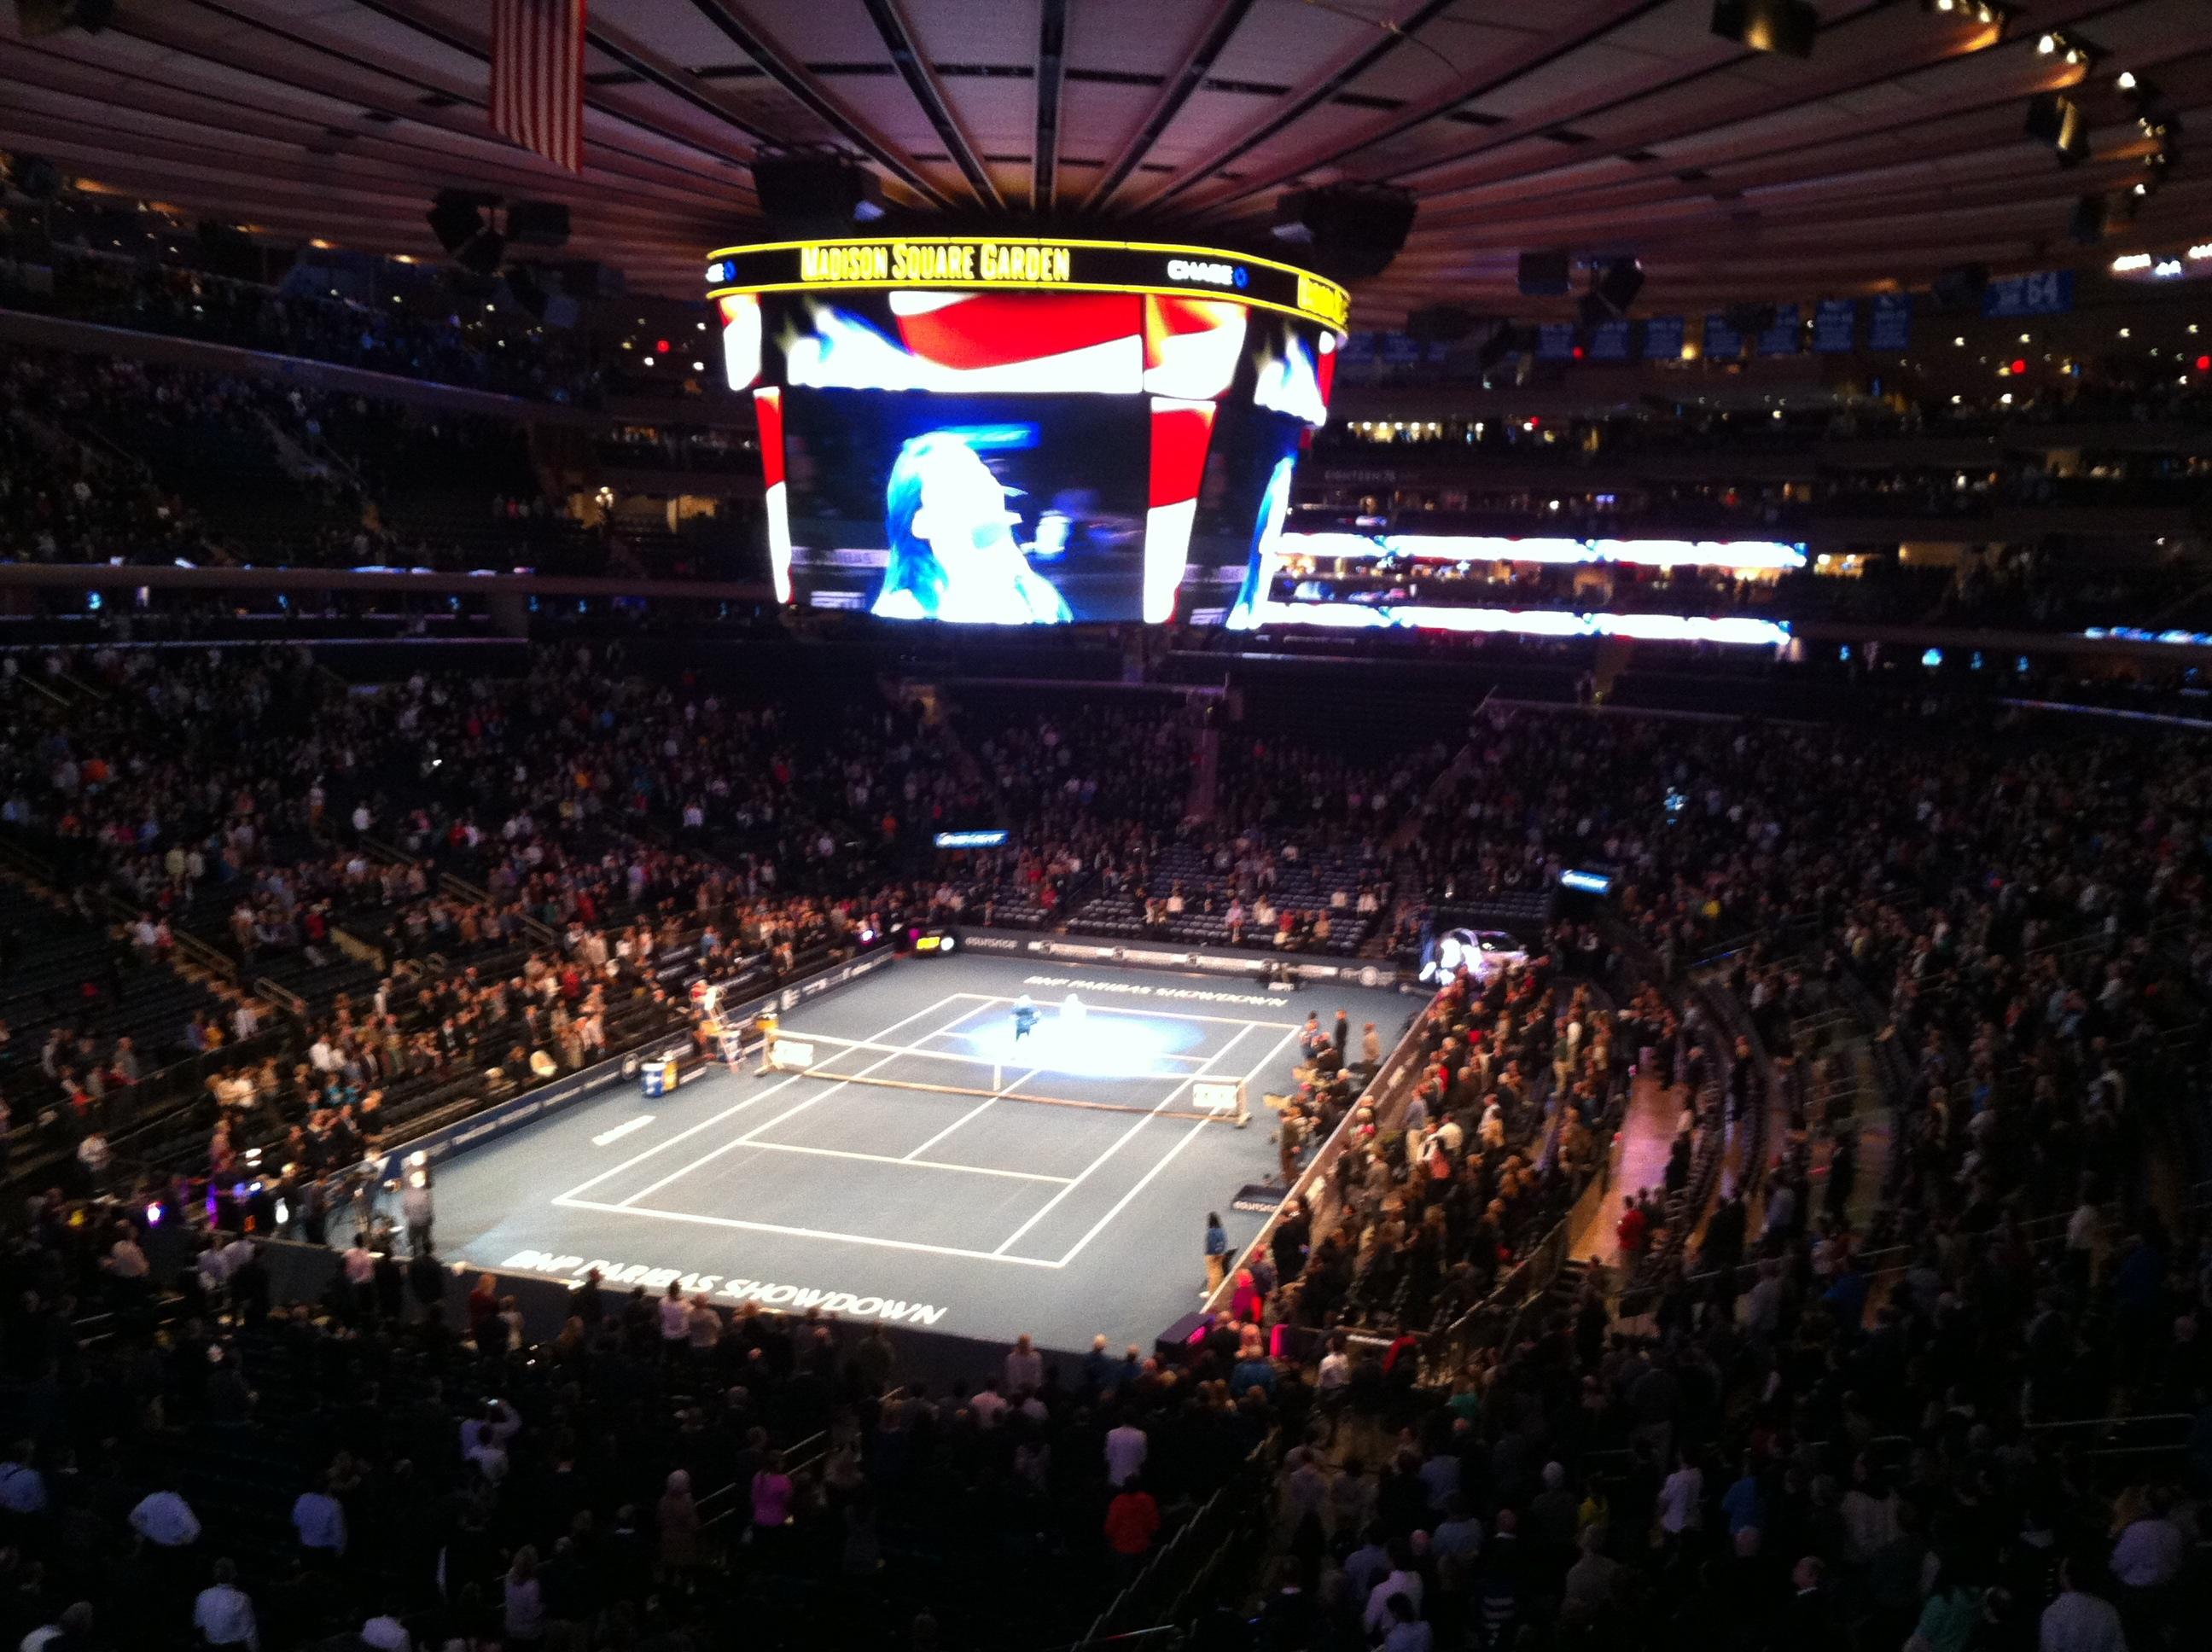 World Tennis Day at Madison Square Garden watching Andy Murray vs Novak Djokovic…standard Monday night, right?